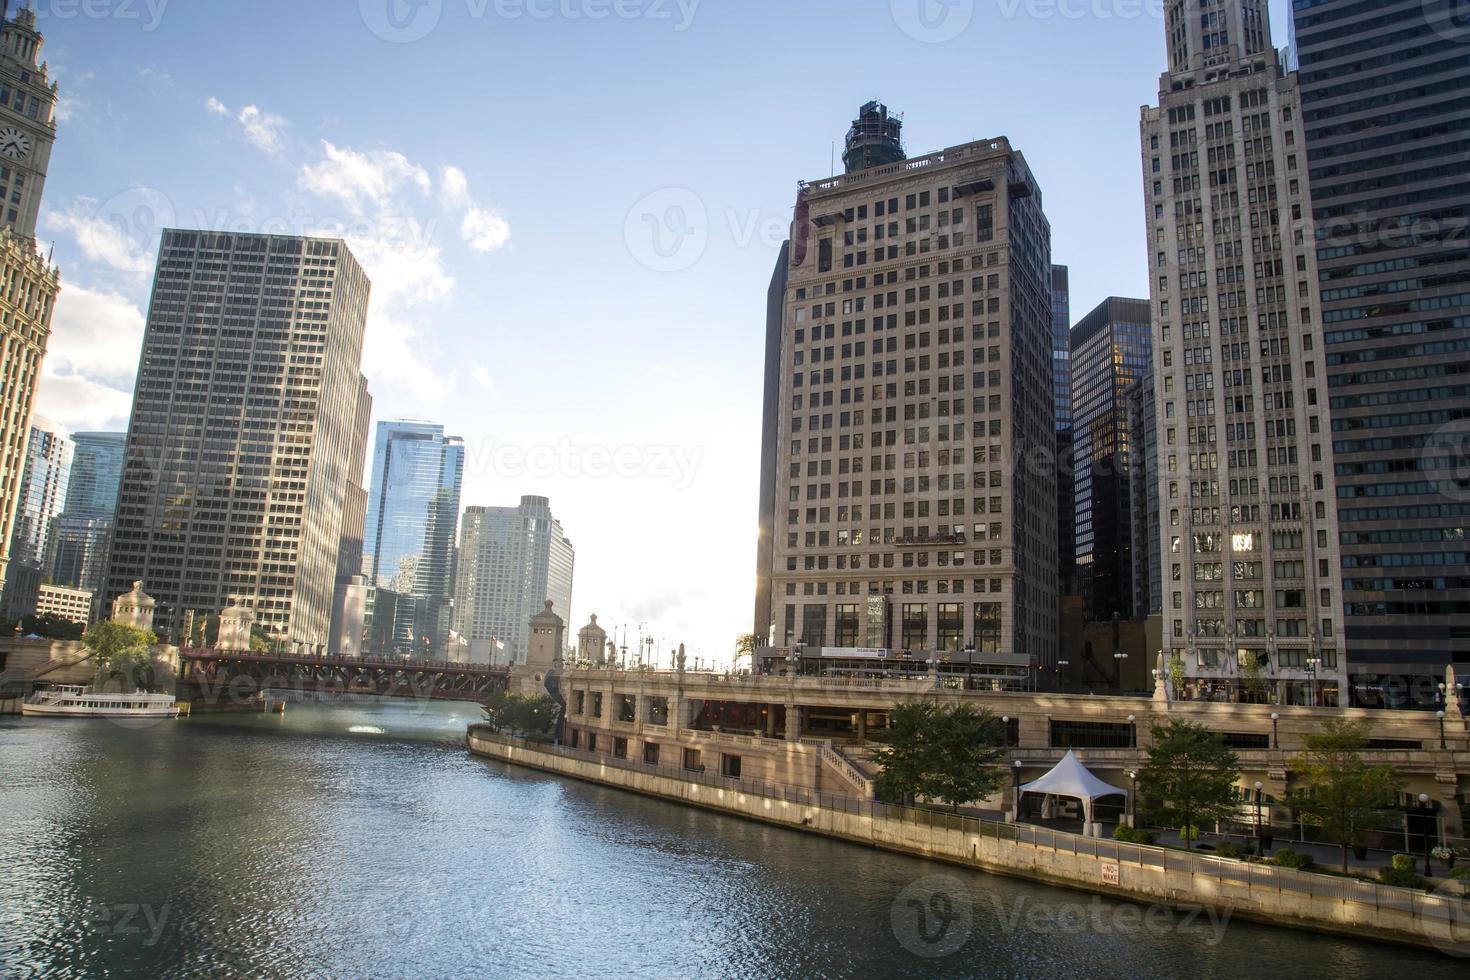 usa - illinois - chicago, chicago river skyline photo